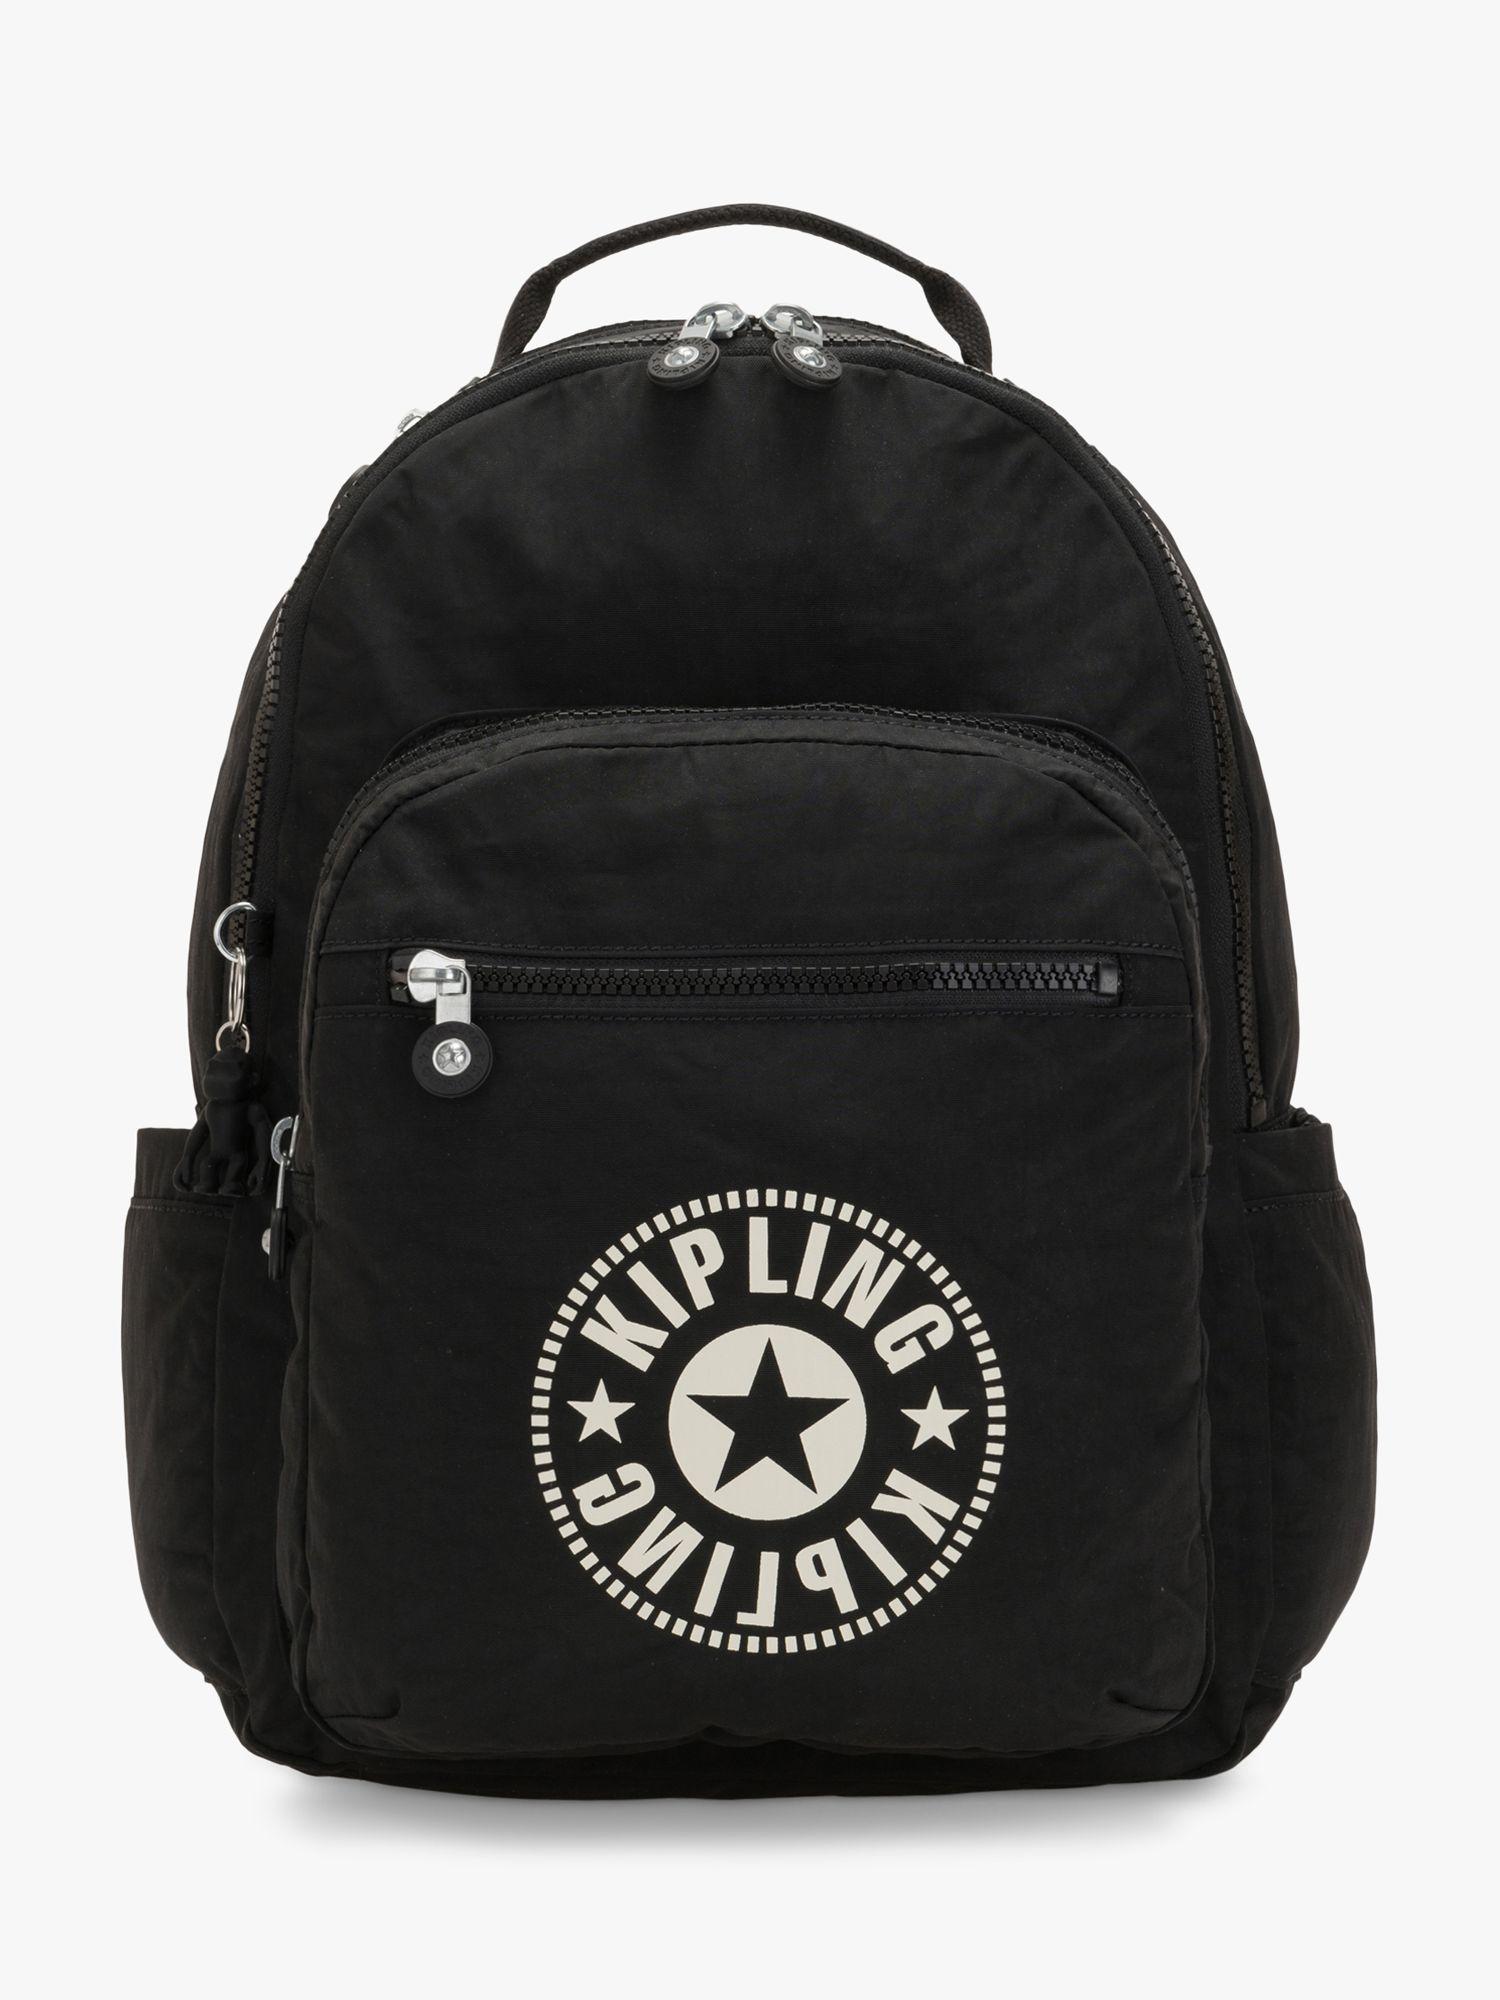 Kipling Kipling Seoul Backpack